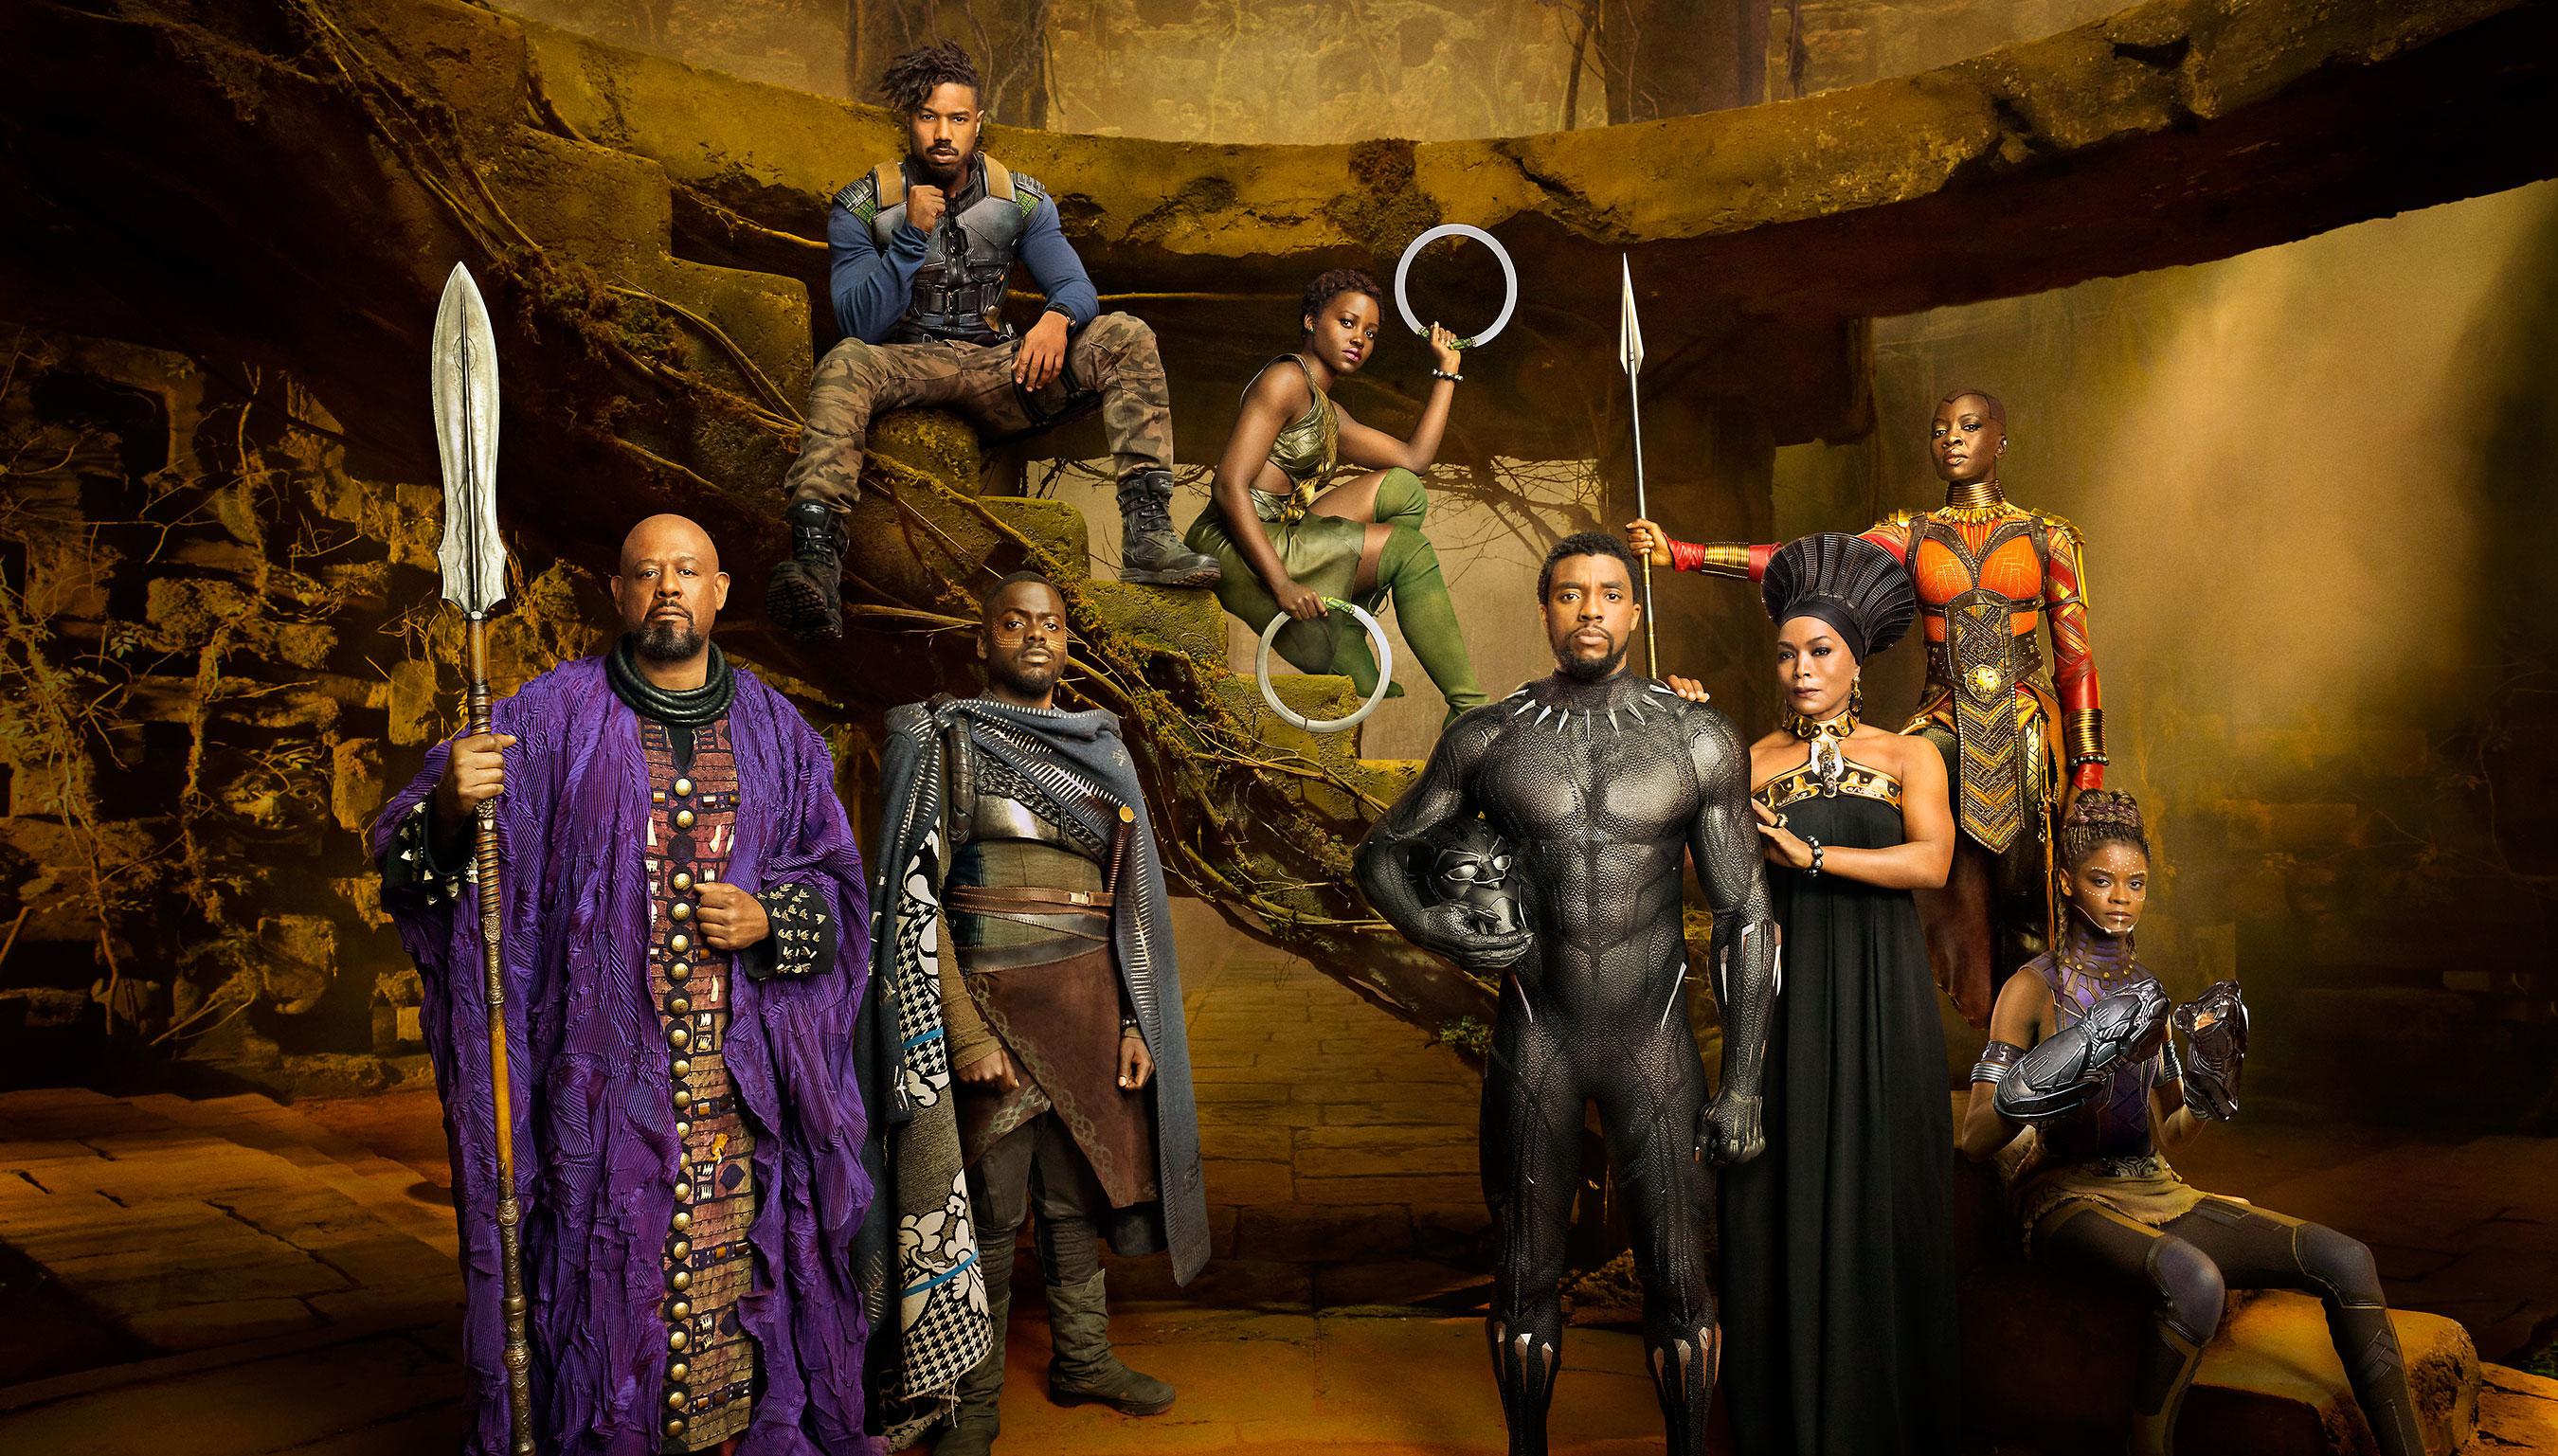 Black Panther haikamatiki, yazidi kutikisa dunia kwenye mauzo